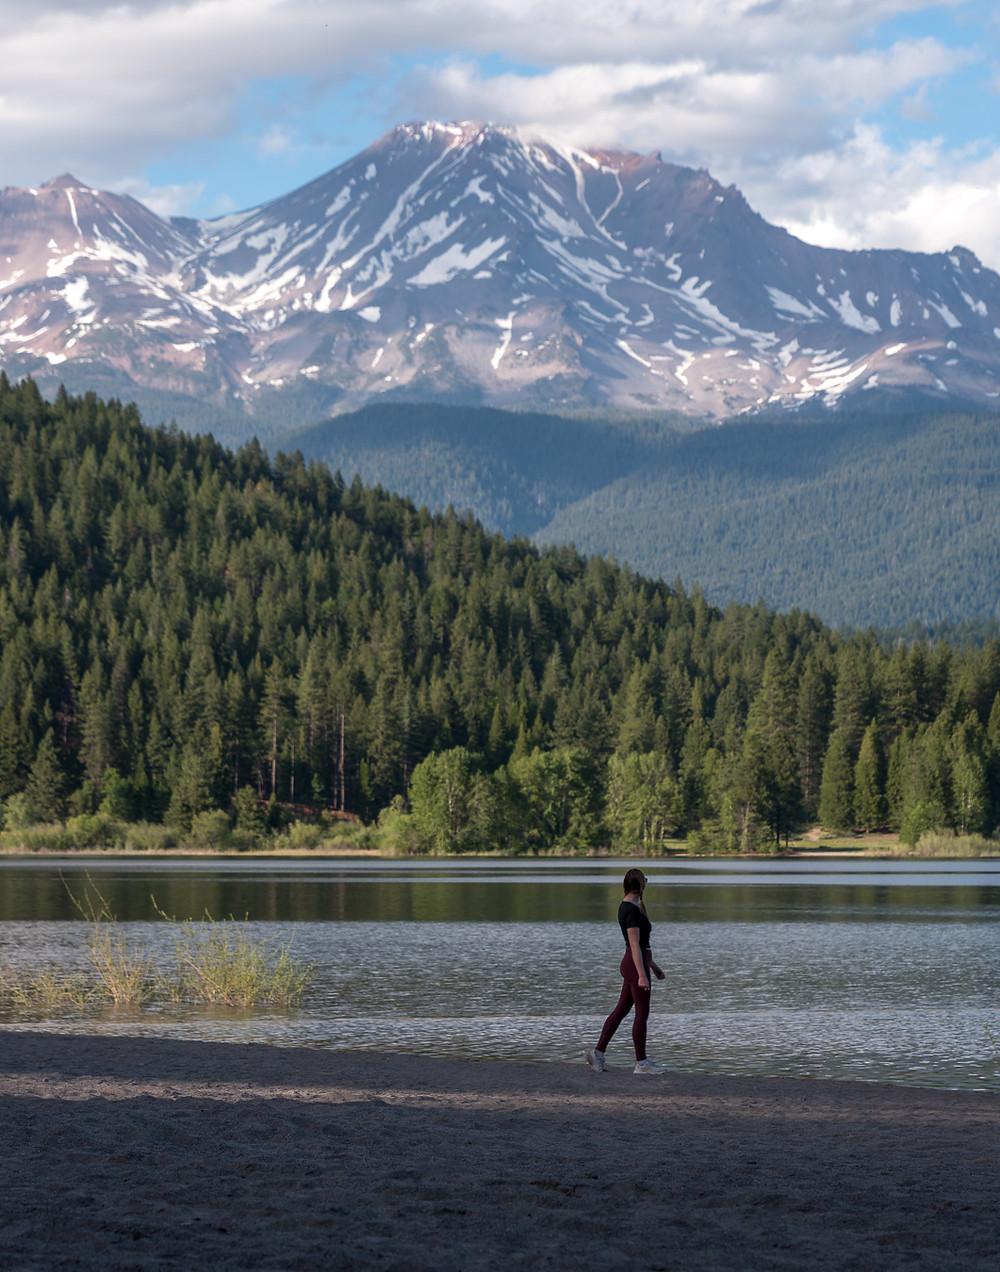 Lake Siskiyou in Mt Shasta California